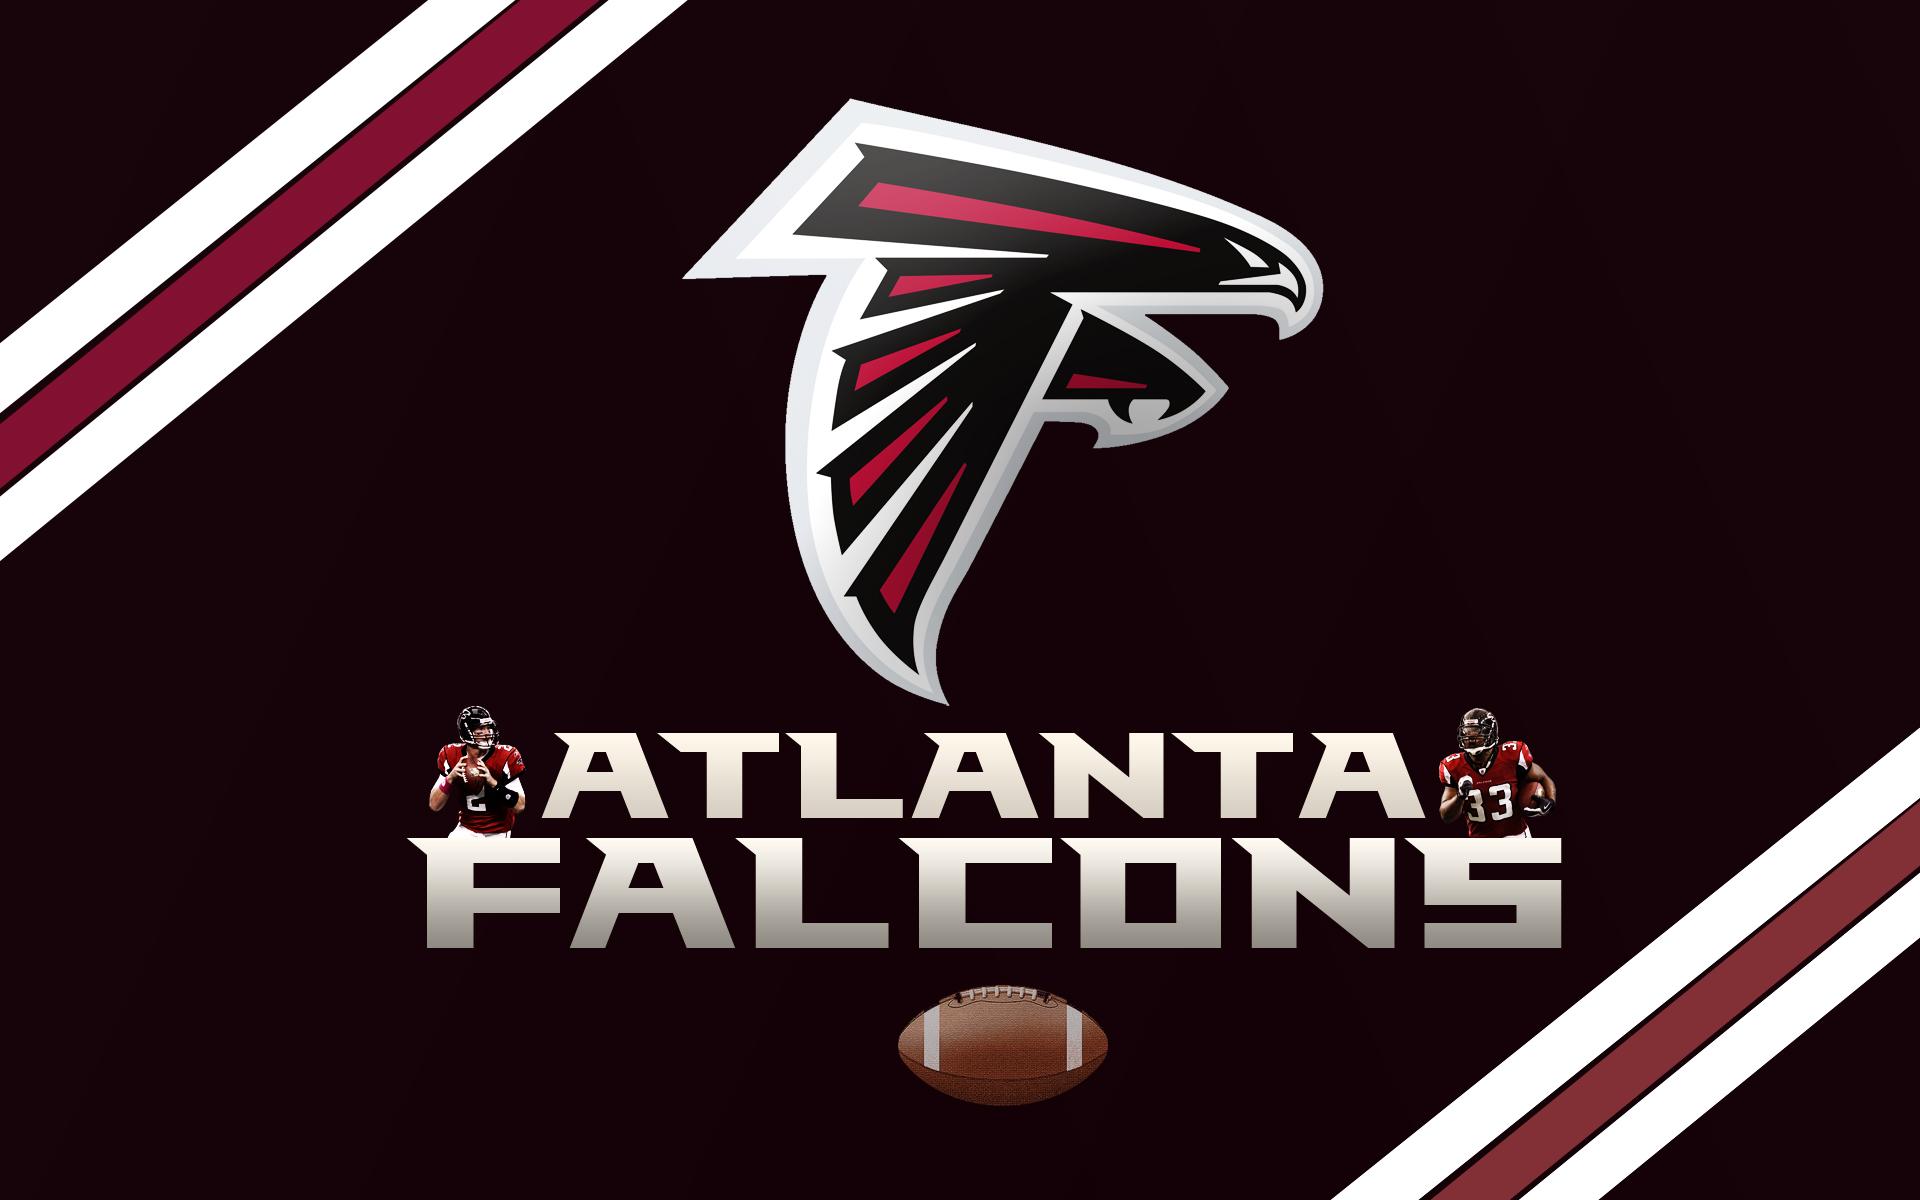 High Resolution Wallpaper | Atlanta Falcons  1920x1200 px